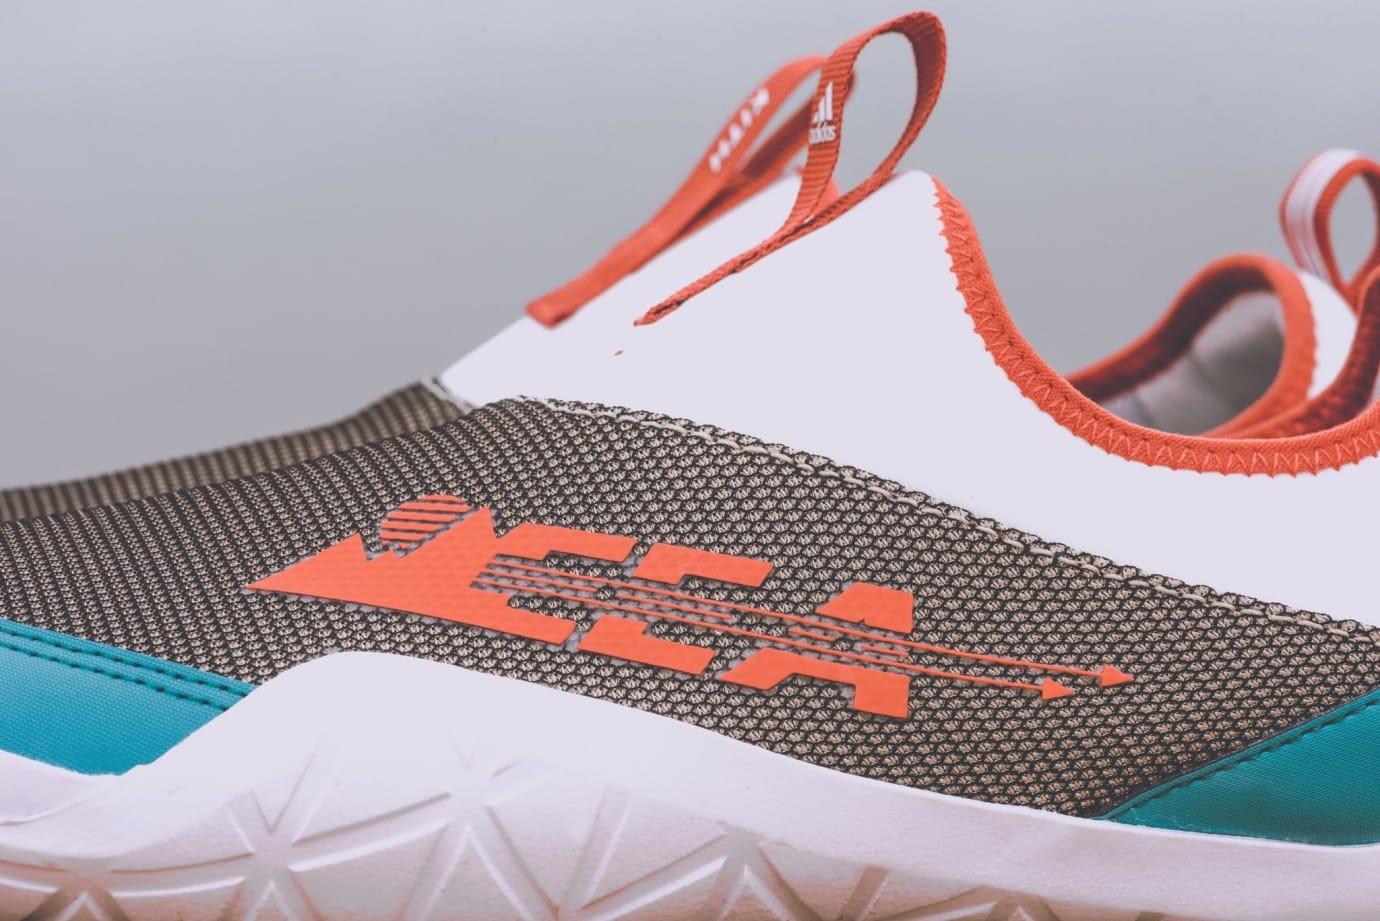 Kith x Adidas Climacool Jawpaw Slip-On (Detail)